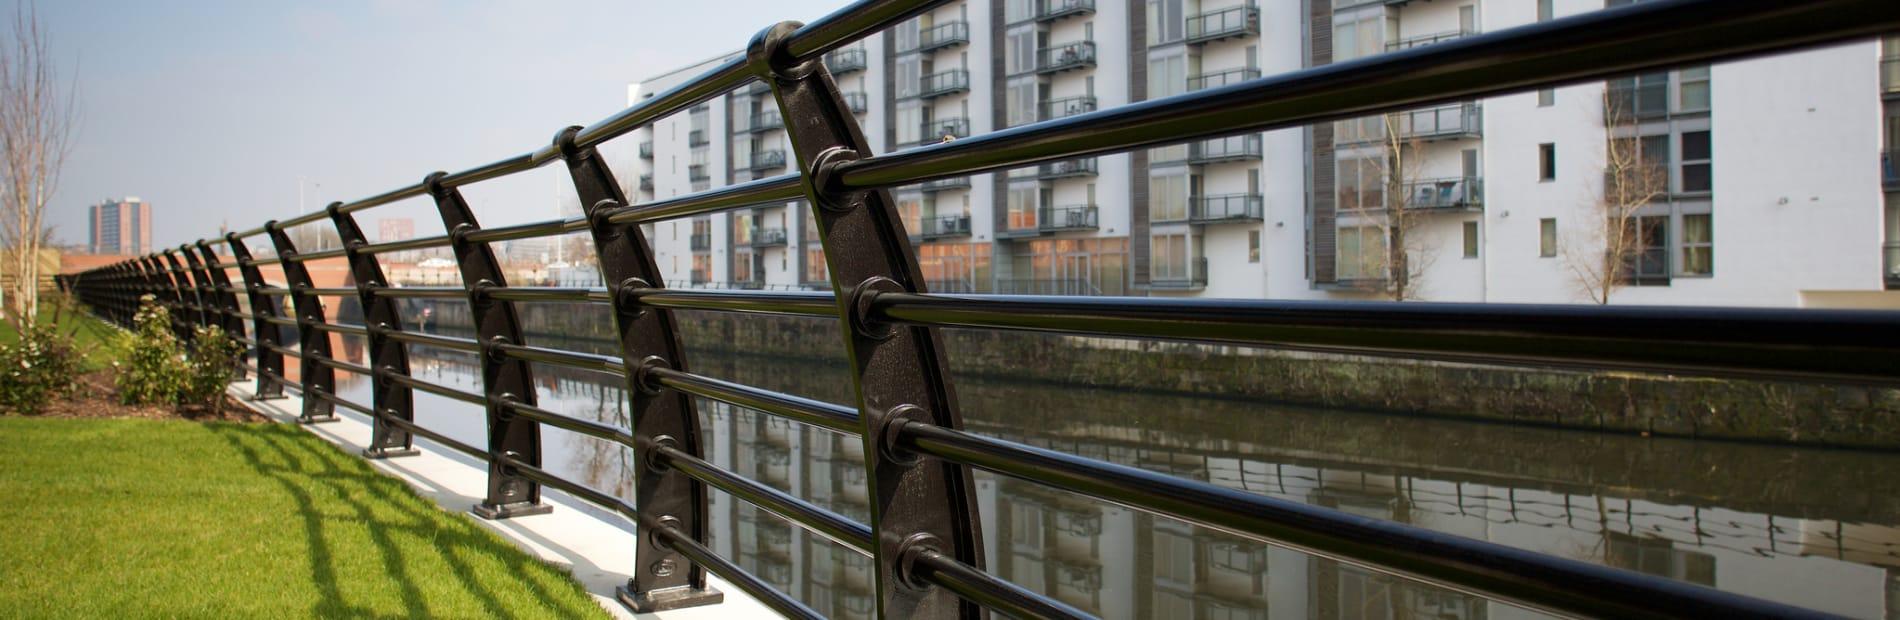 Black railings outside apartment block.